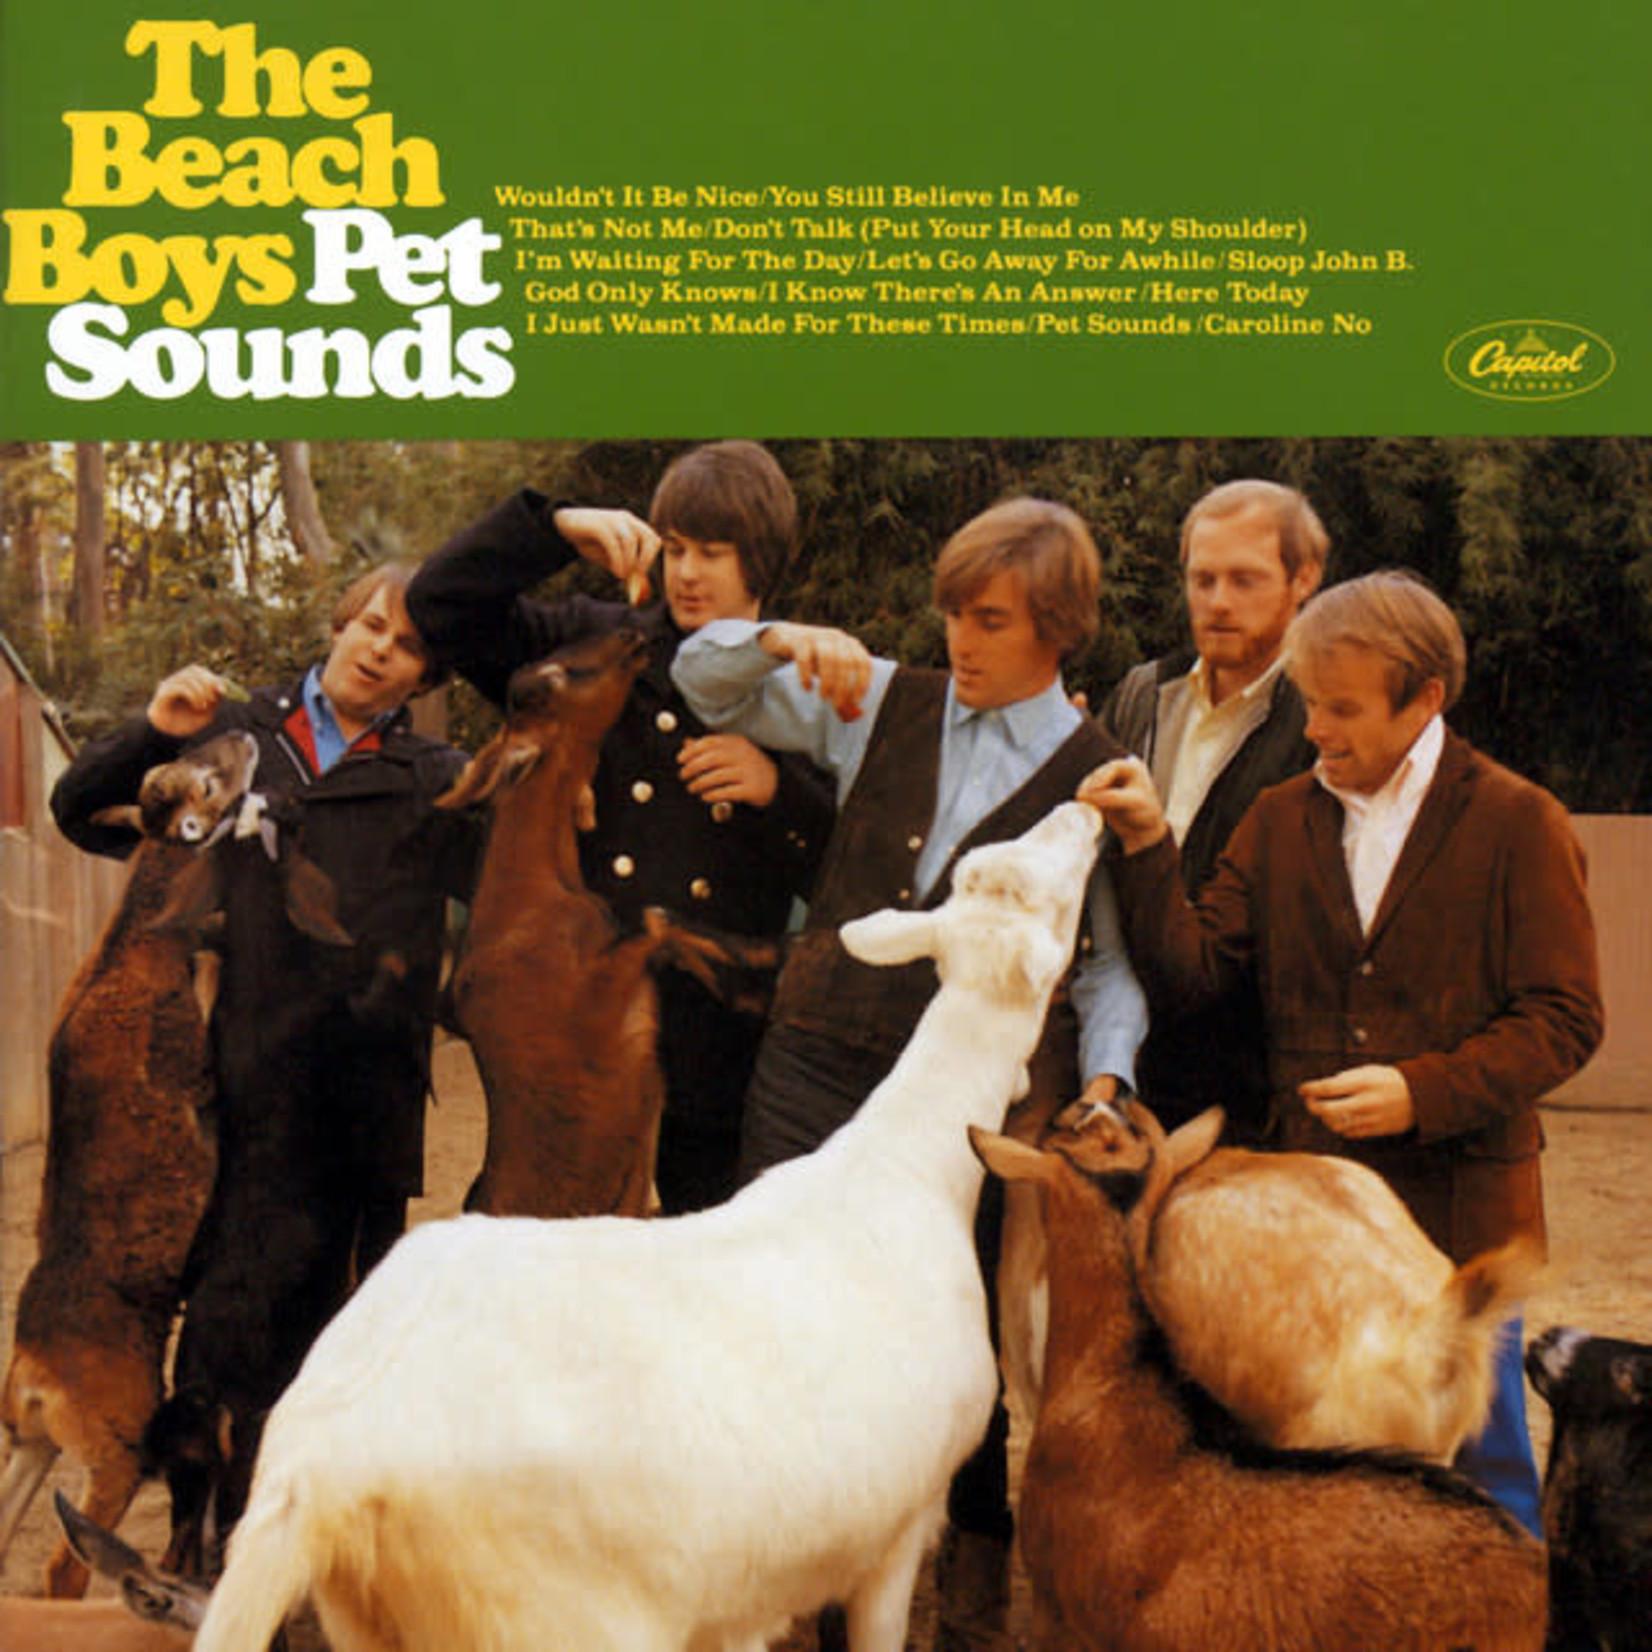 Vinyl The Beach Boys - Pet Sounds - 45  RPM Mono